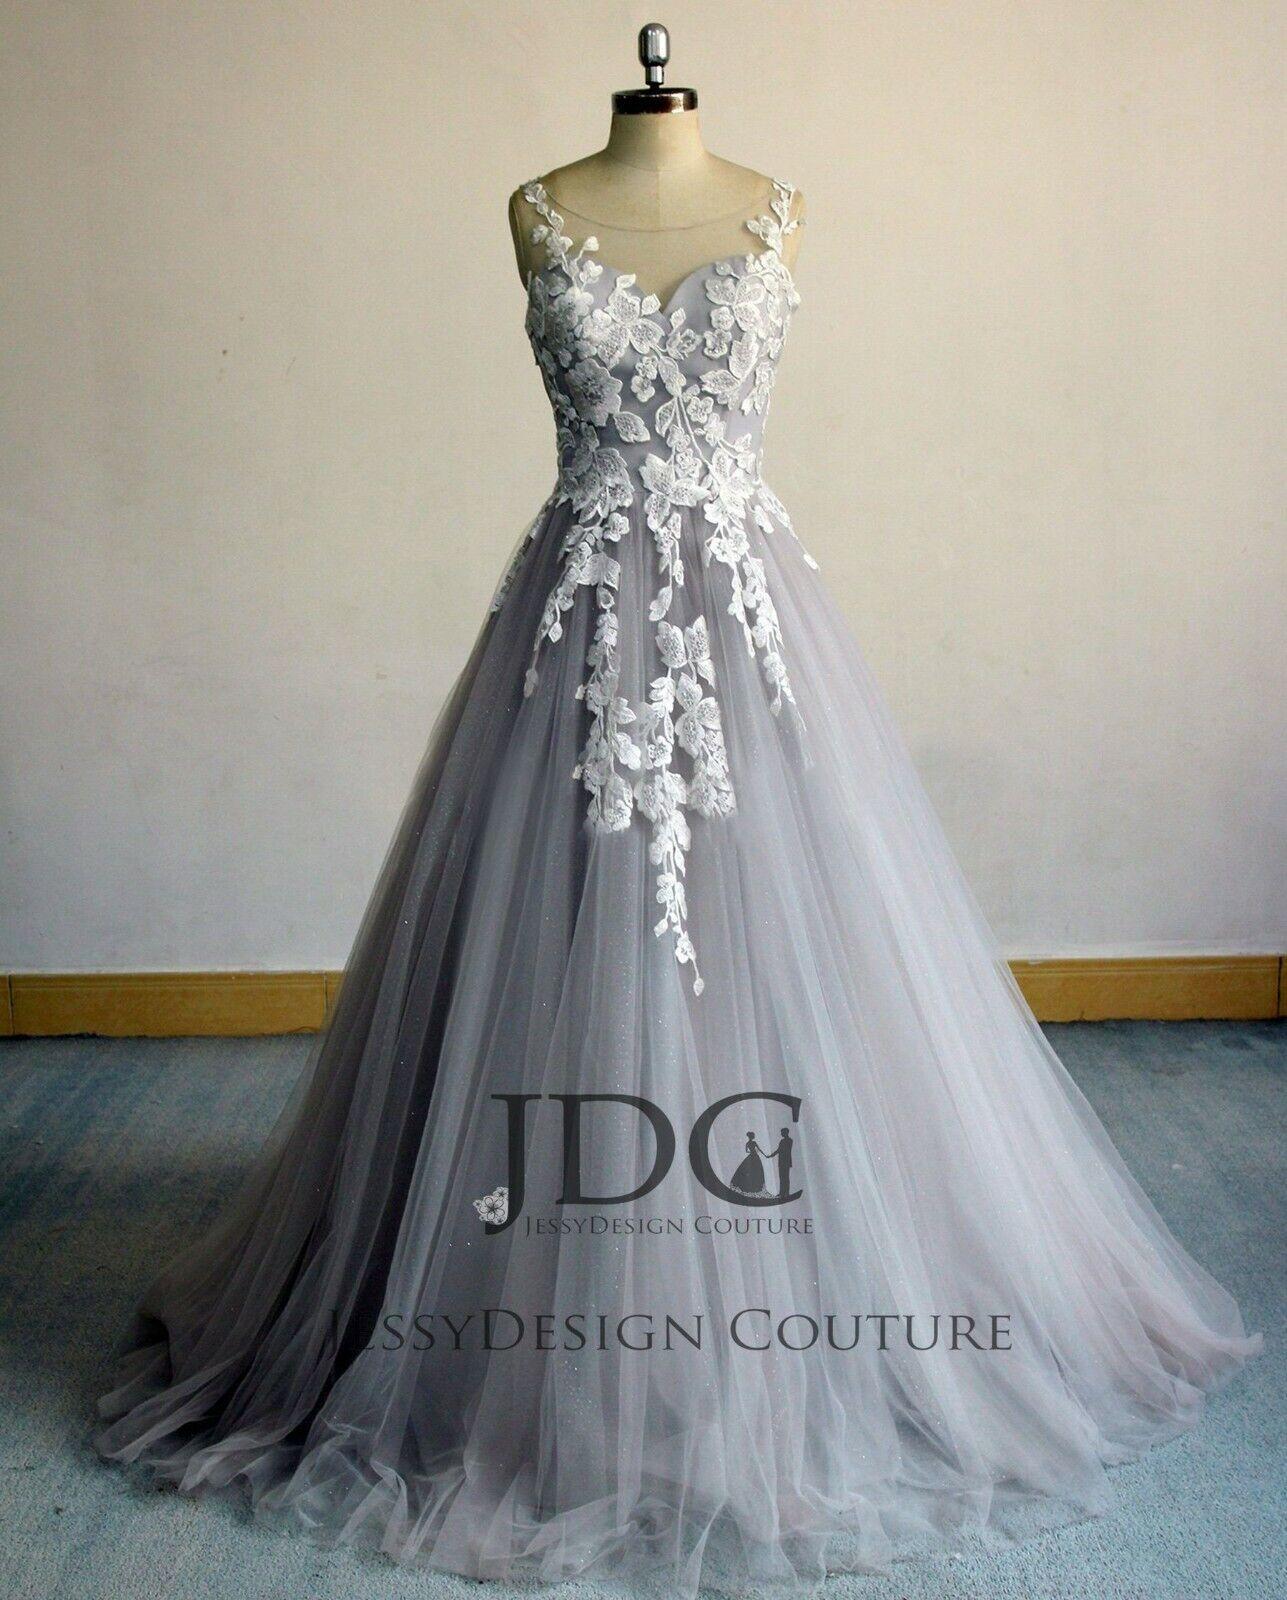 NEU Glitzer Brautkleid Hochzeitskleid Floral Spitze 34 36 38 40 42 44 46 48 Grau